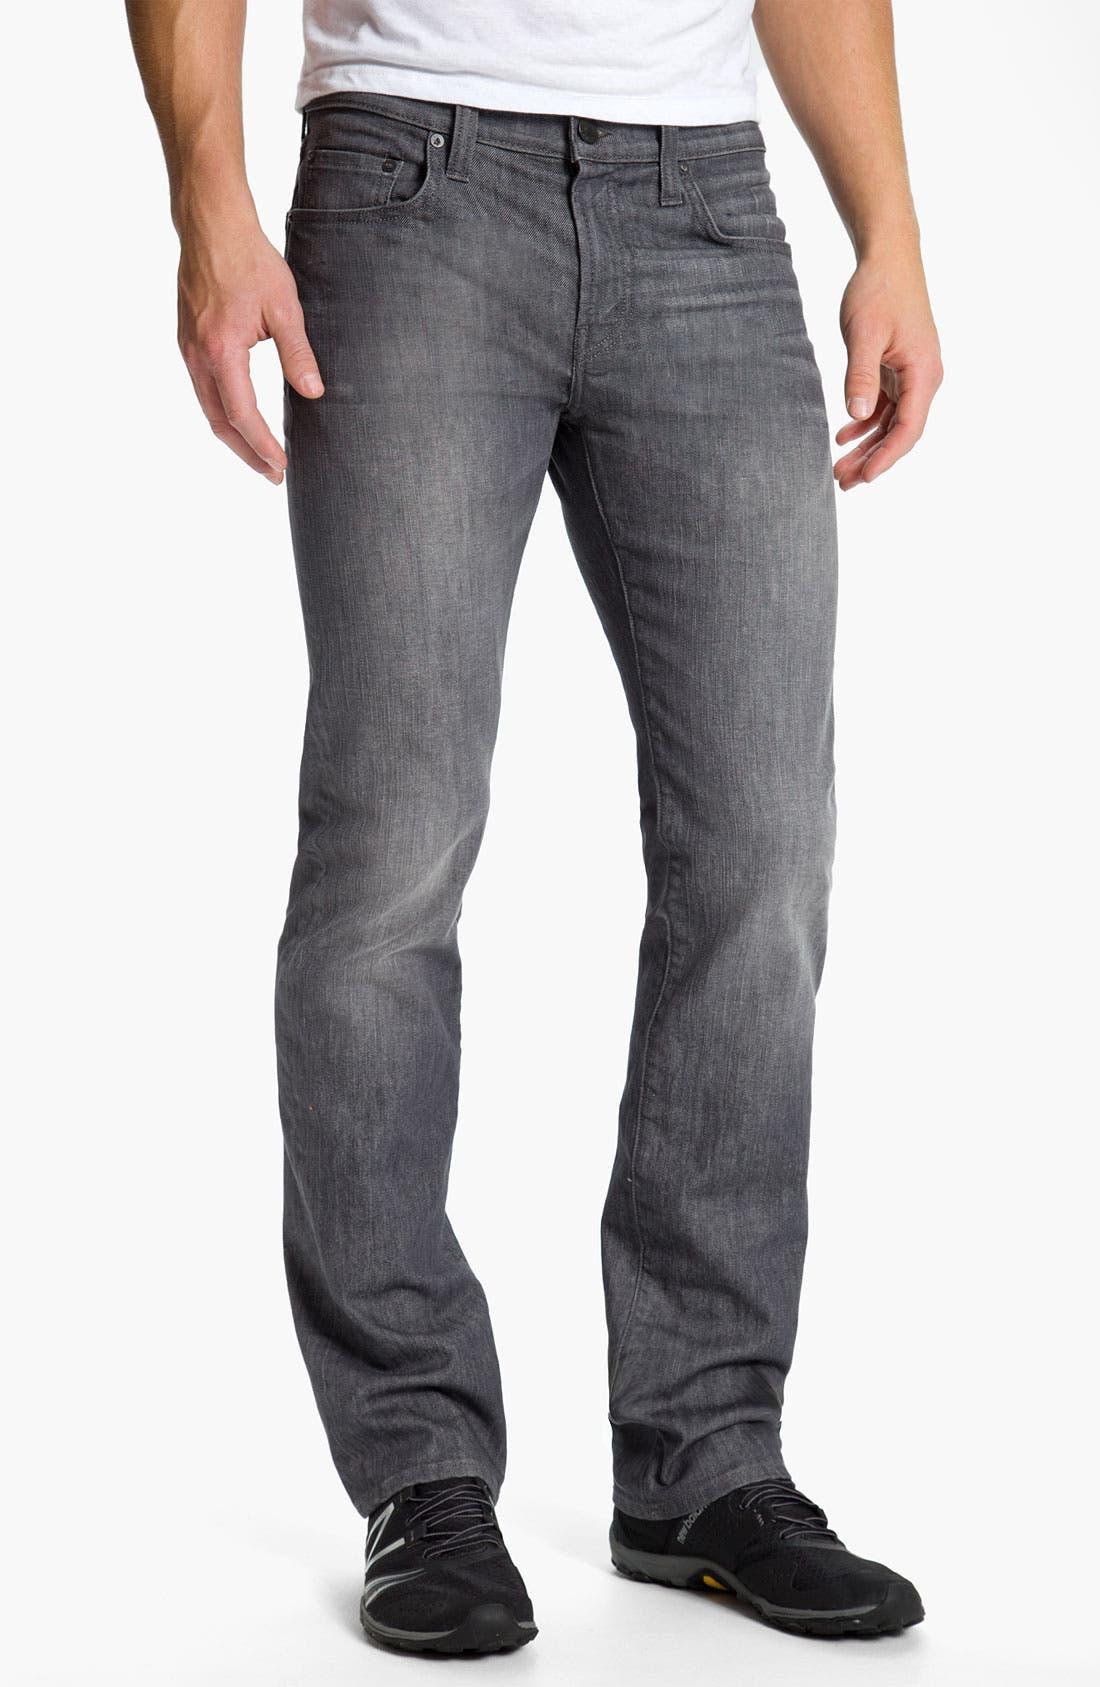 Alternate Image 2  - J Brand 'Kane' Slim Fit Jeans (Ricochet) (Save Now through 12/9)